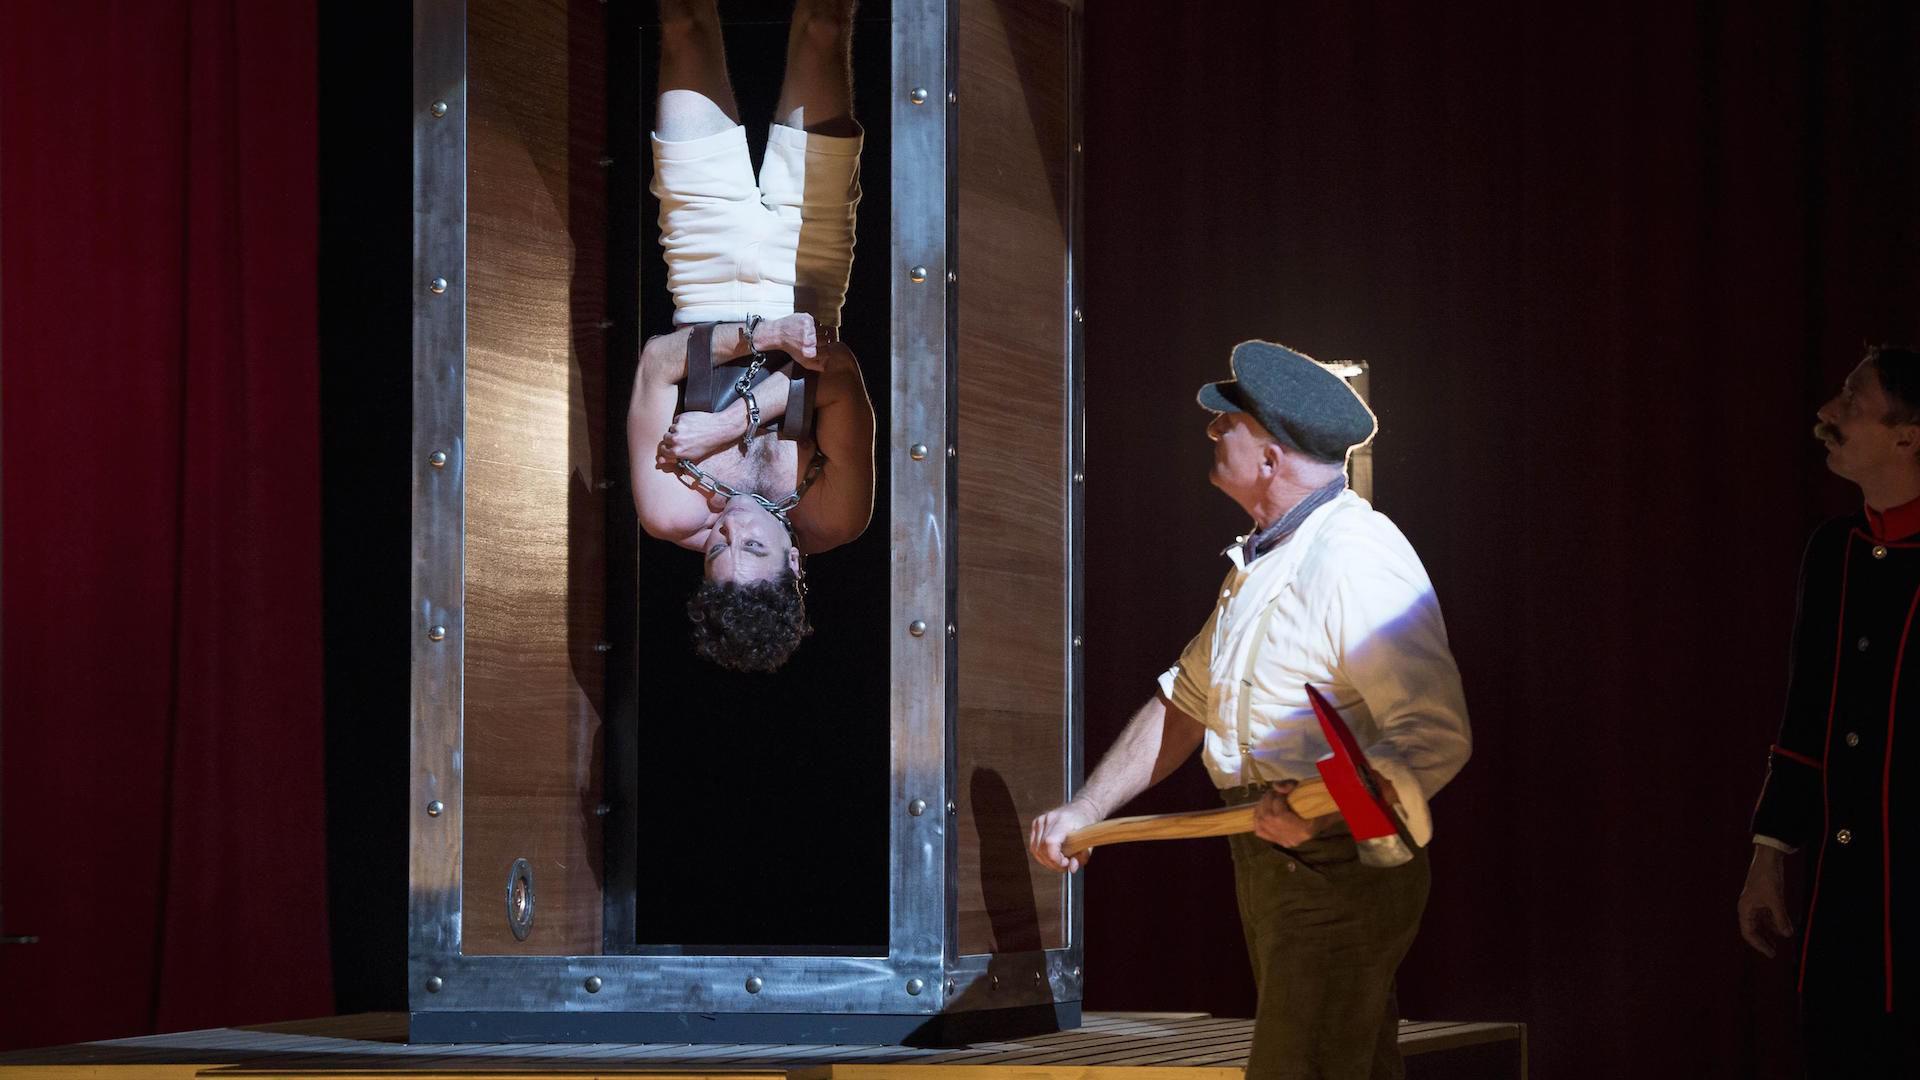 Houdini & Doyle — s01e01 — The Maggie's Redress